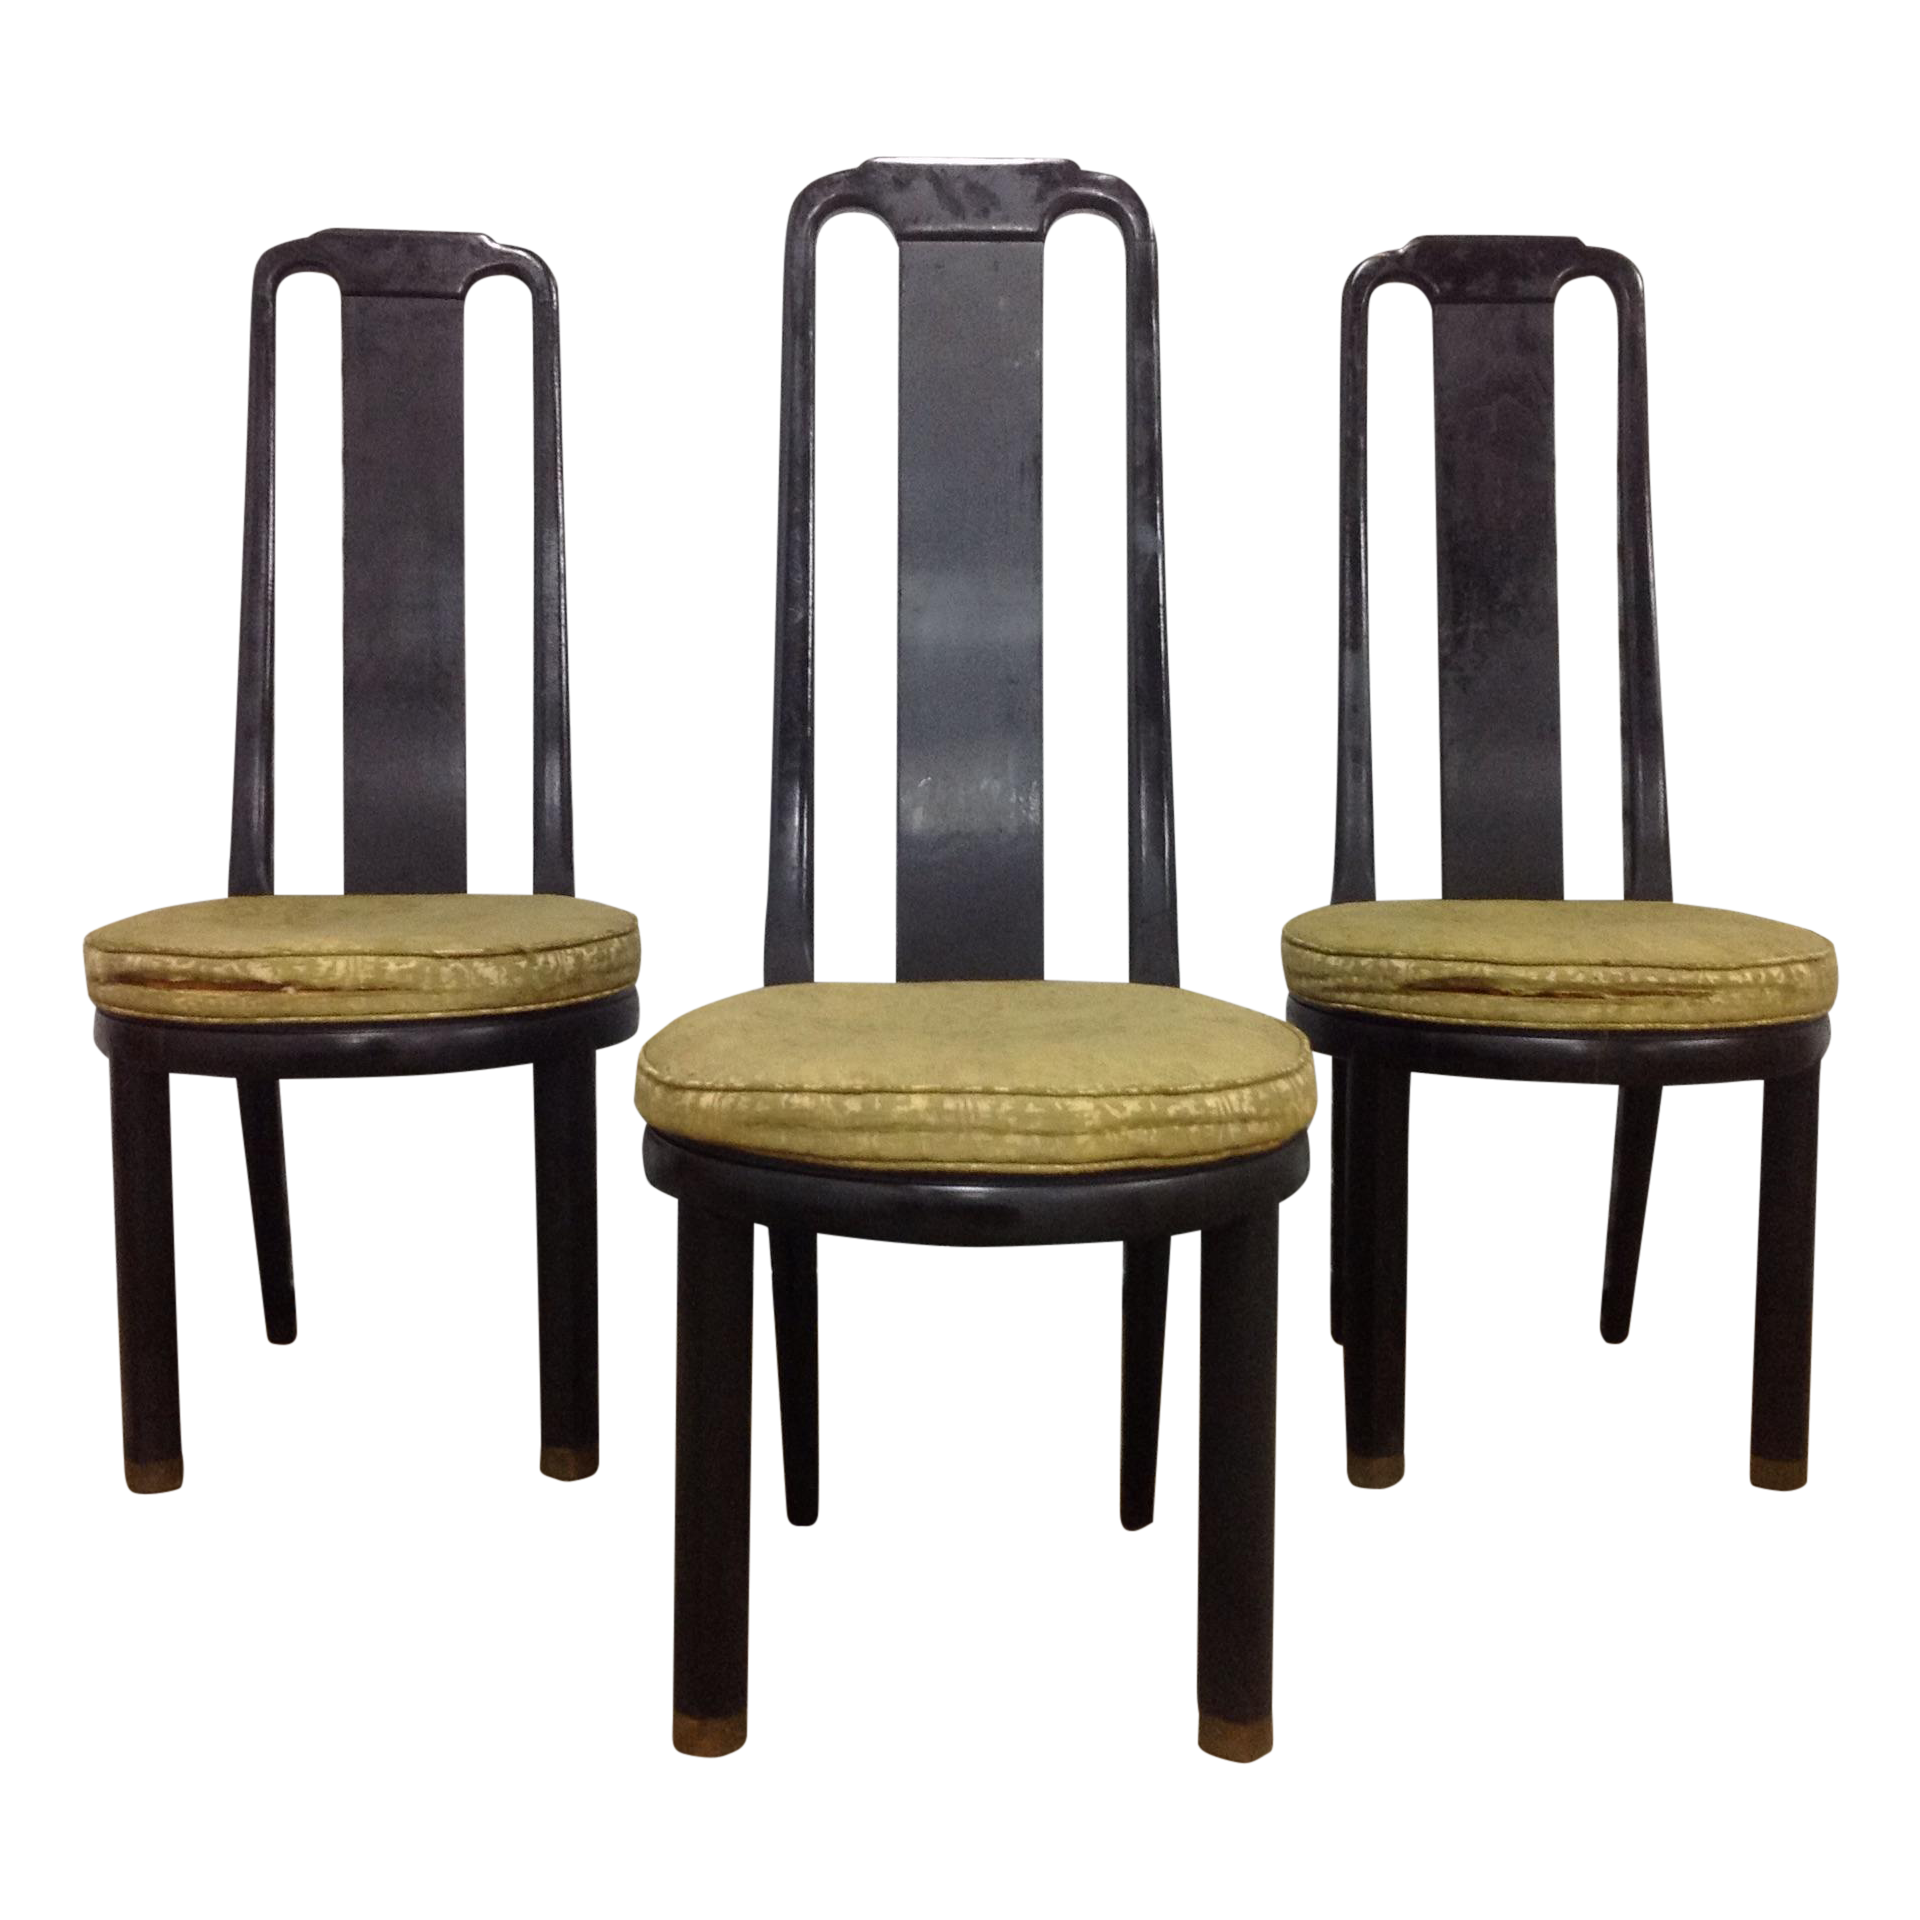 Asian Modern Black Lacquer Chairs By Henredon 3 Chairish